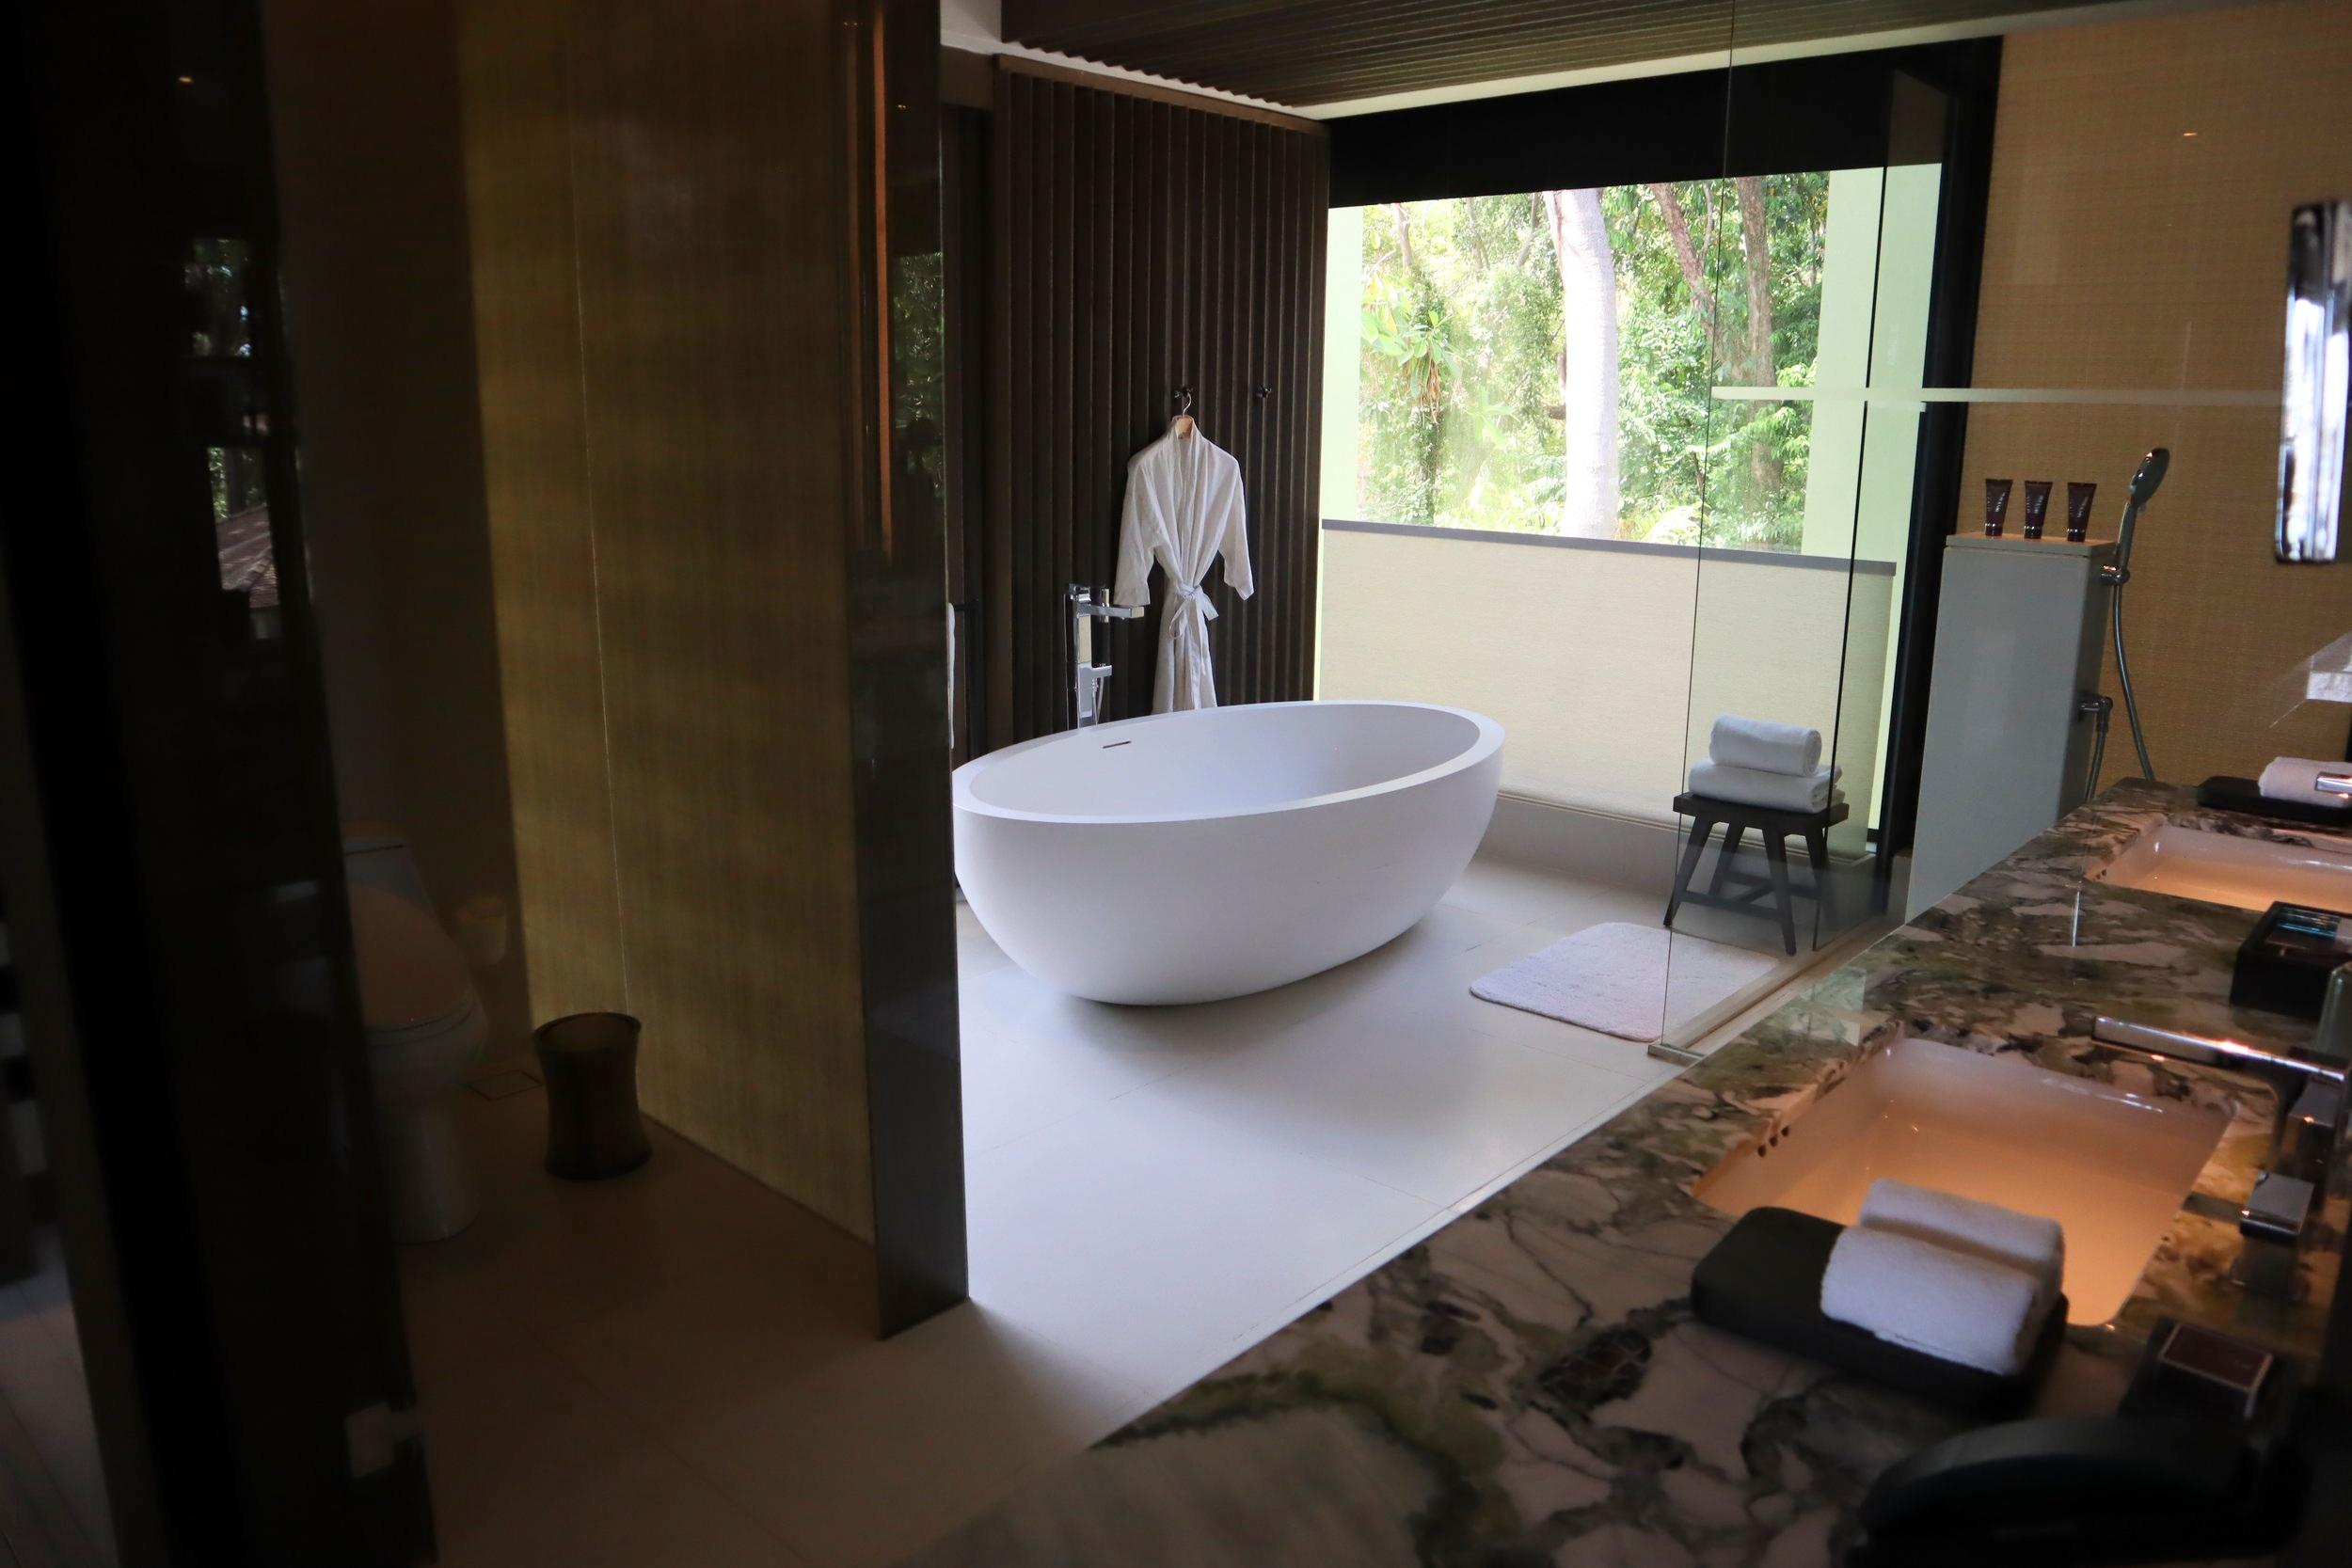 The Ritz-Carlton, Langkawi – Rainforest Junior Suite bathroom